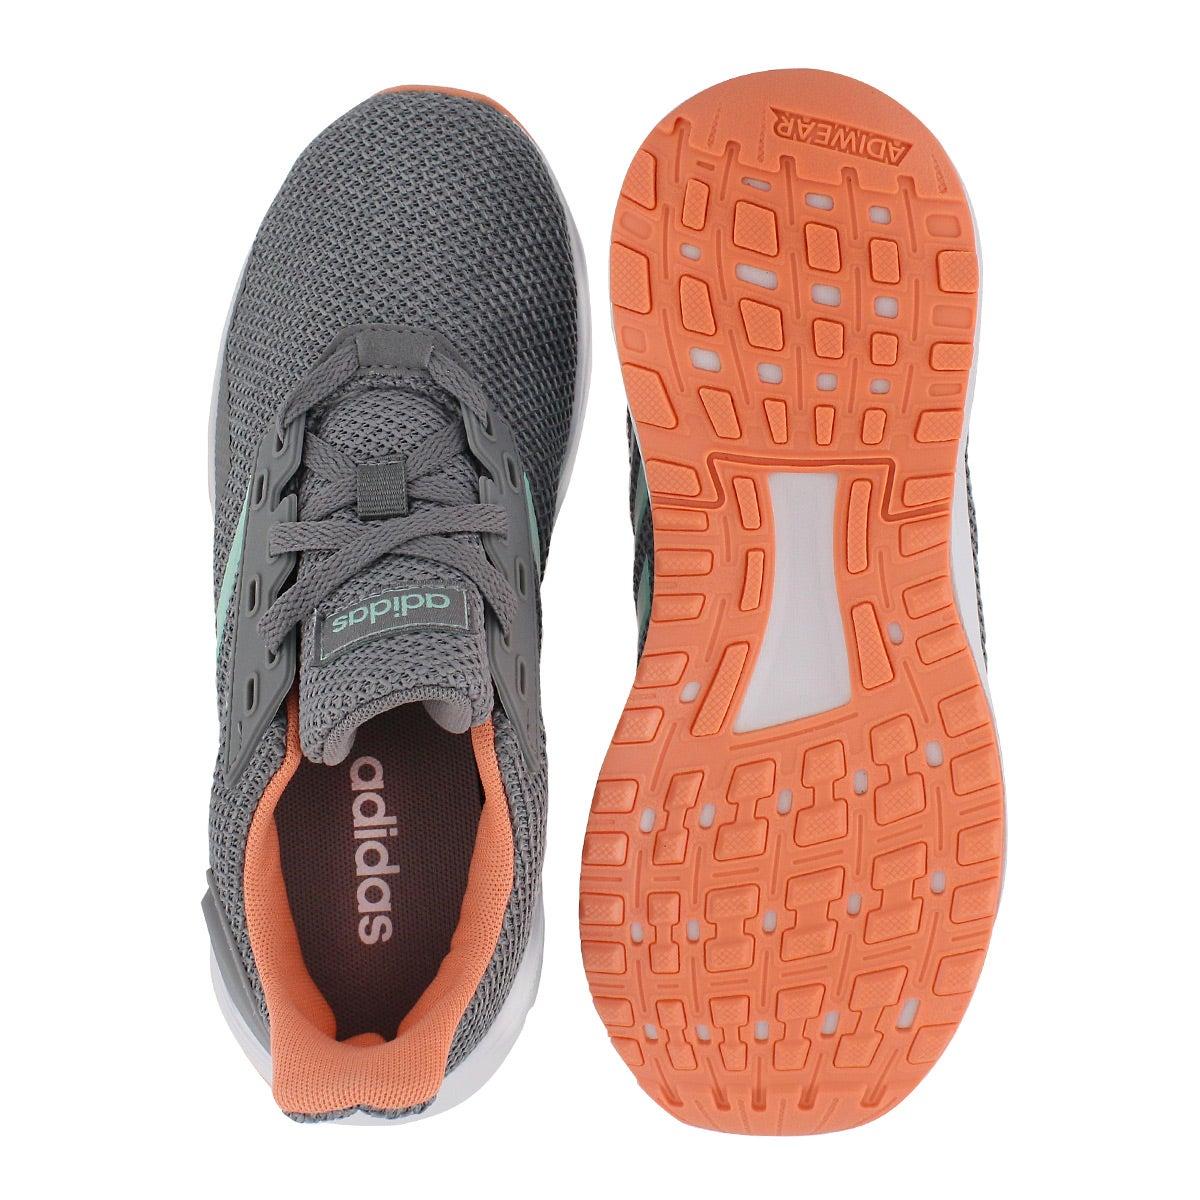 Grls Duramo 9 K gry/mnt/grnite sneaker